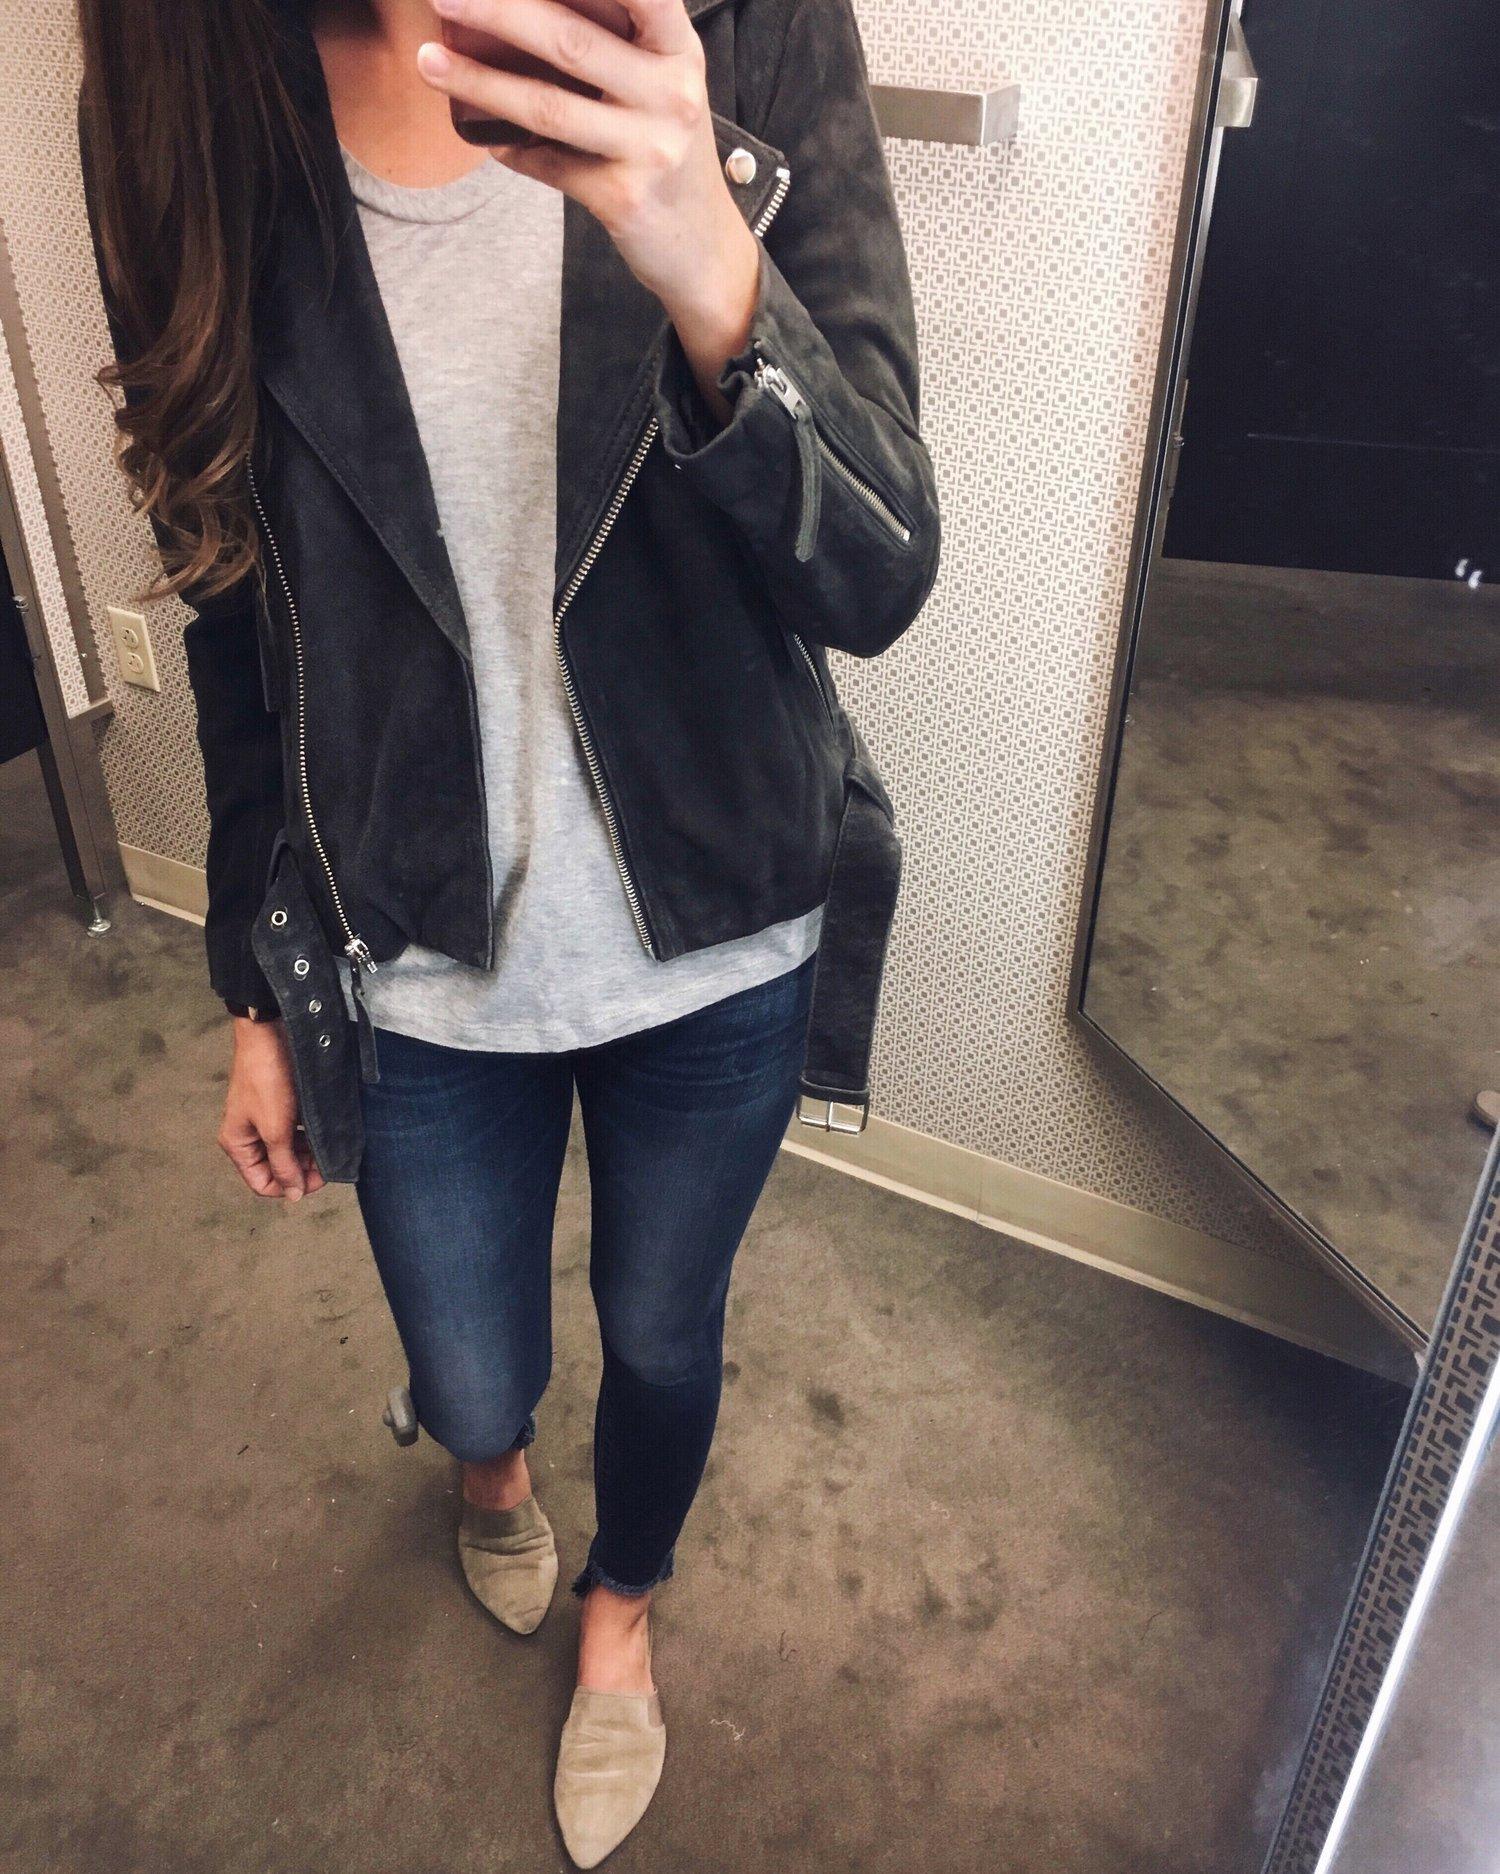 Topshop Moto Jacket  |  Caslon Tee  |  Hudson Jeans